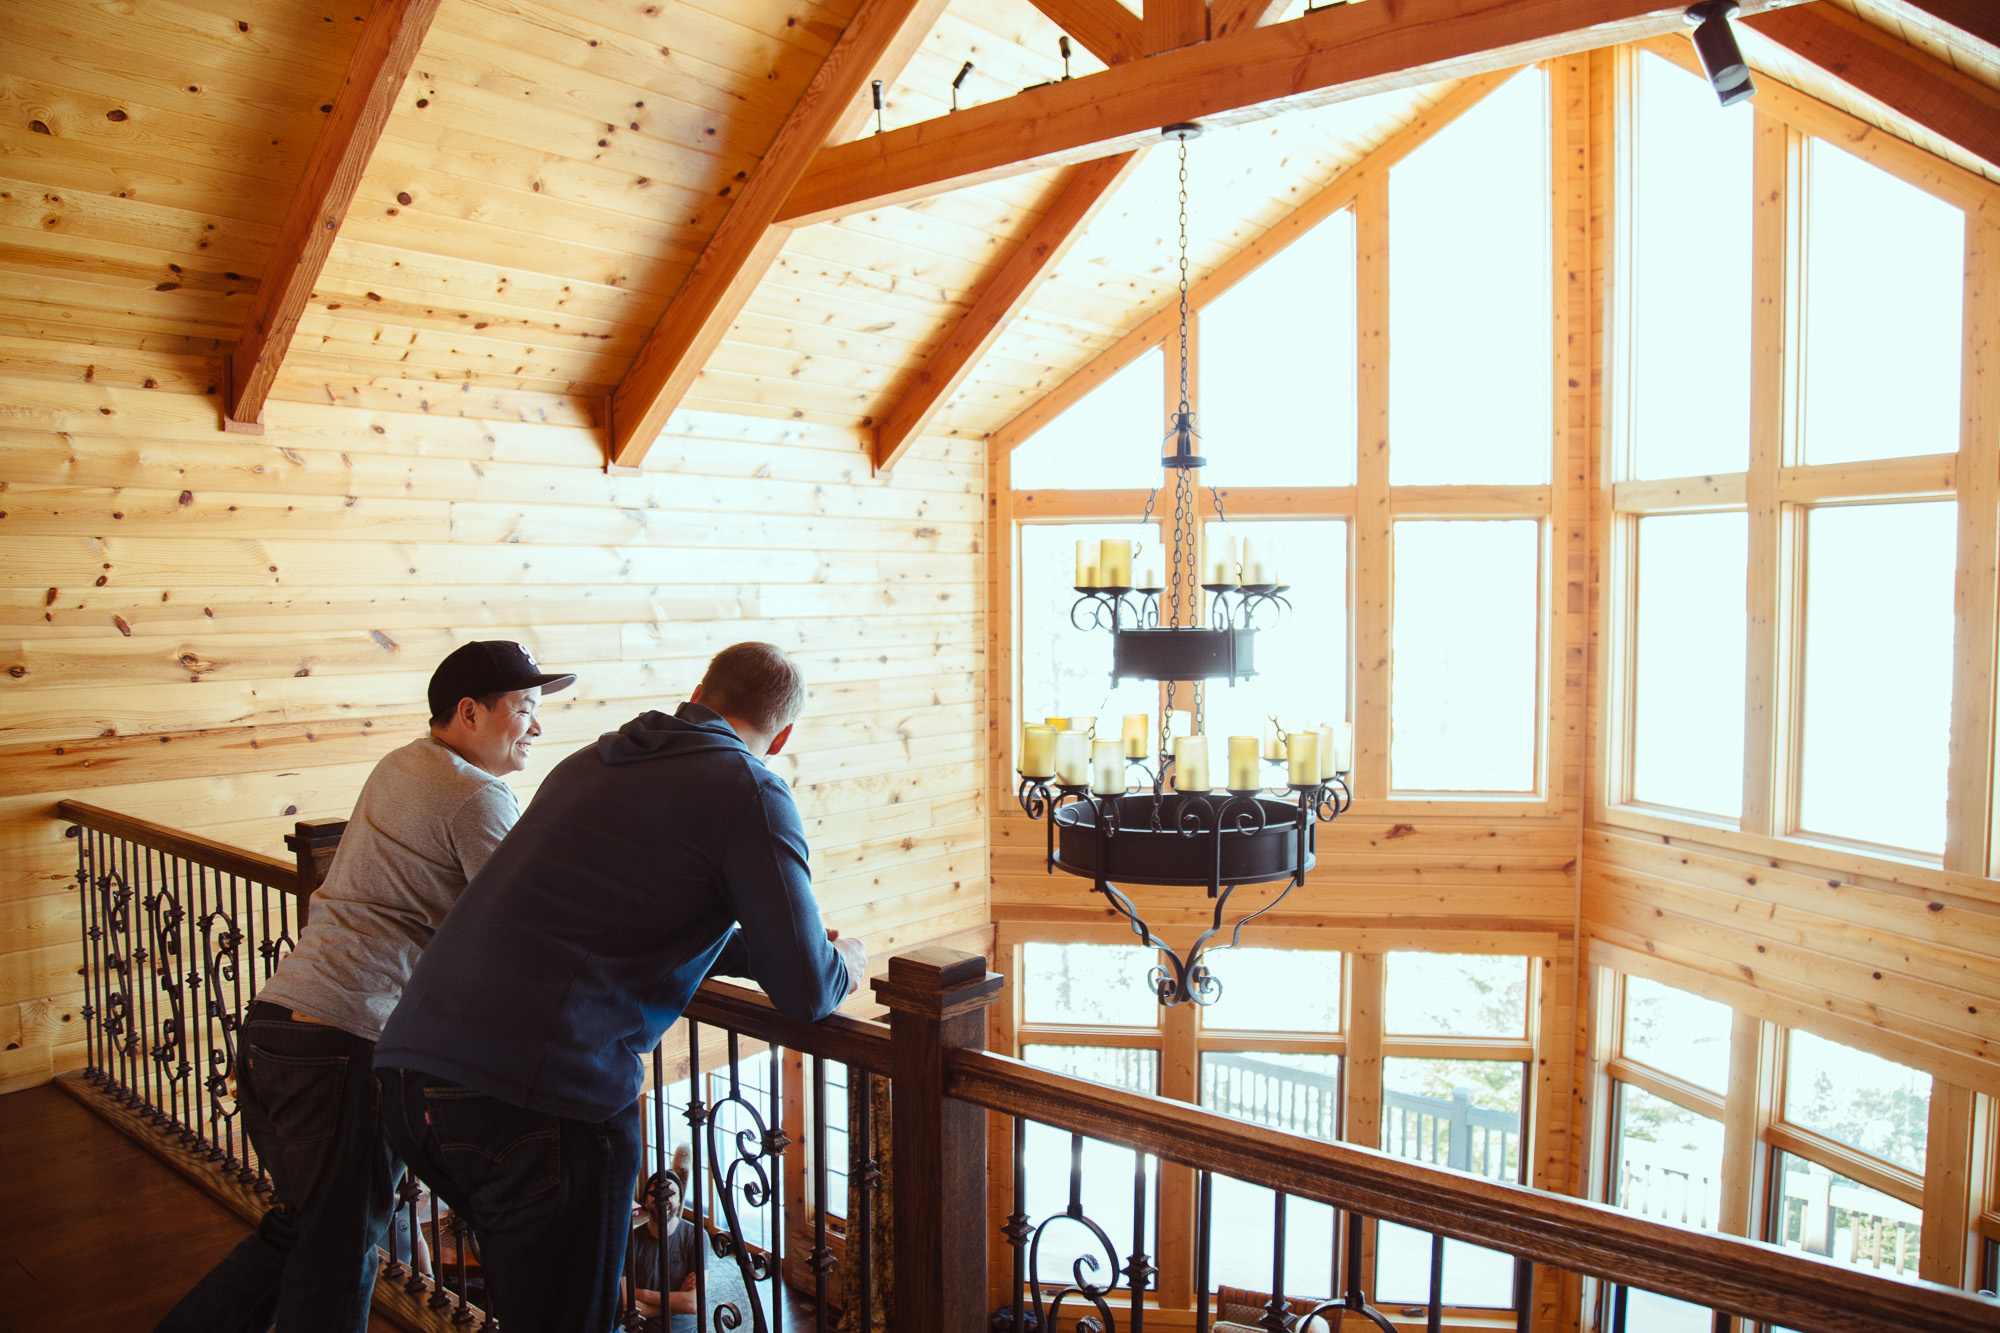 People chatting inside log cabin